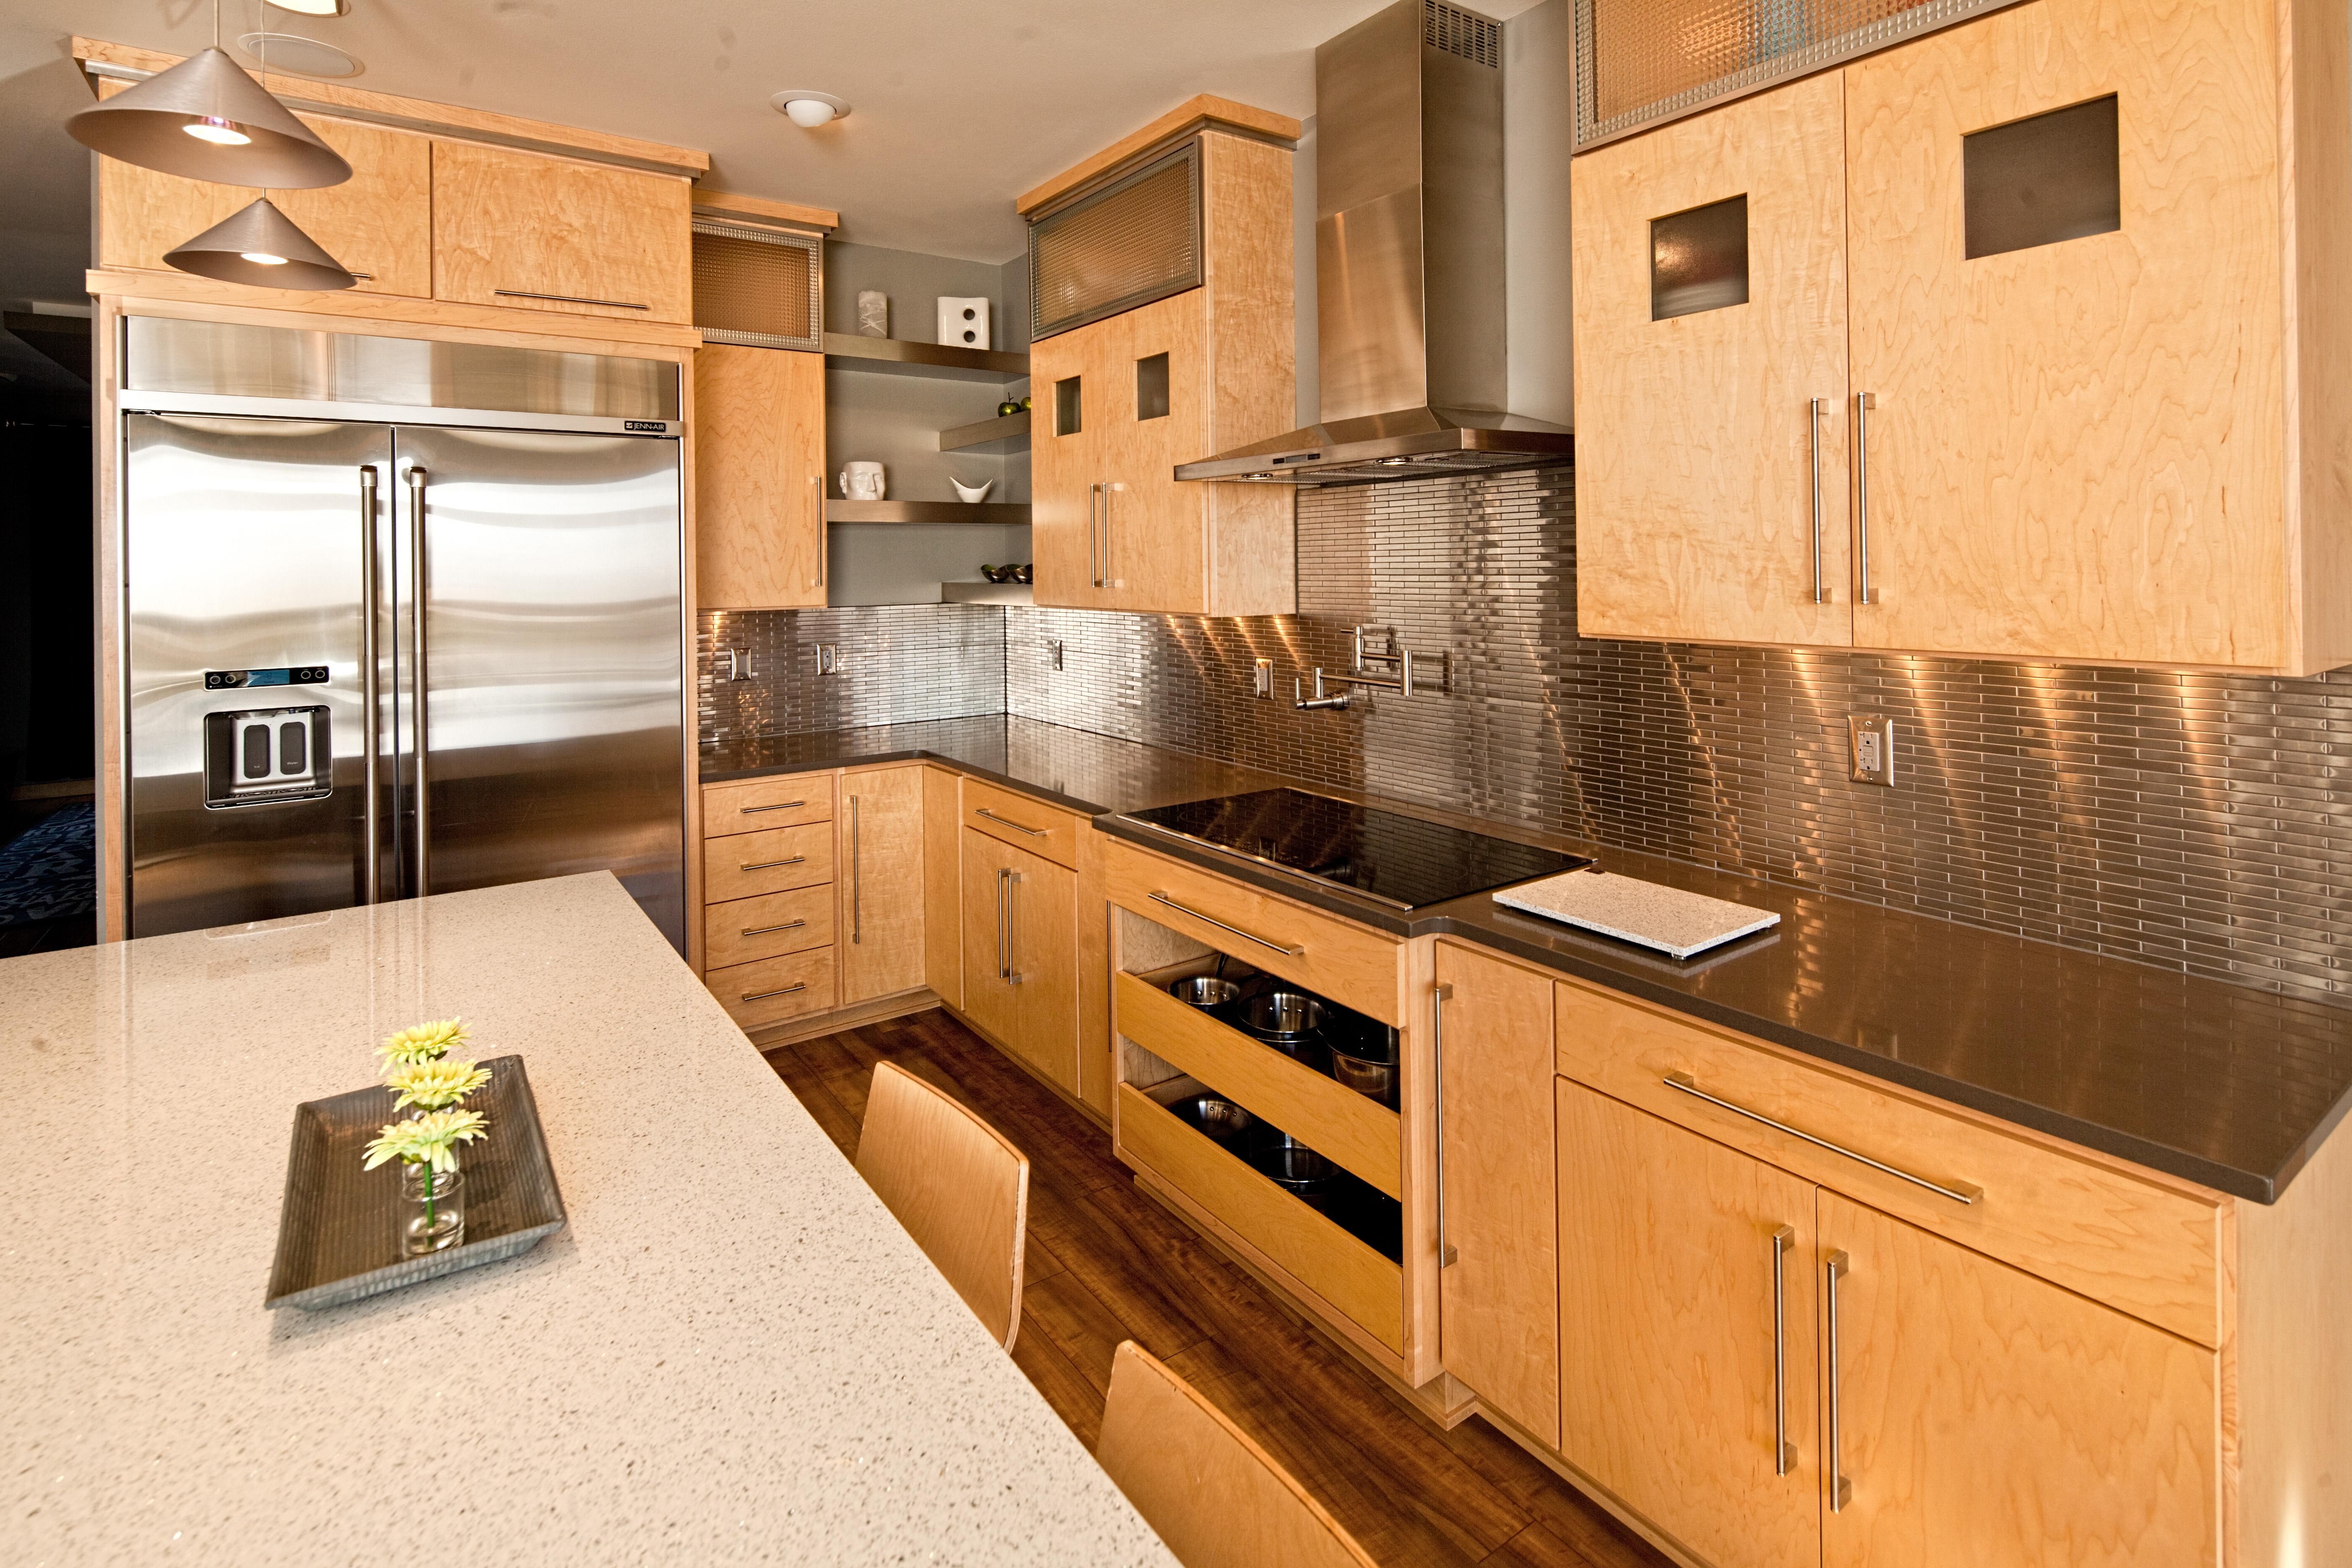 Braaten Kitchens | Braaten Cabinets